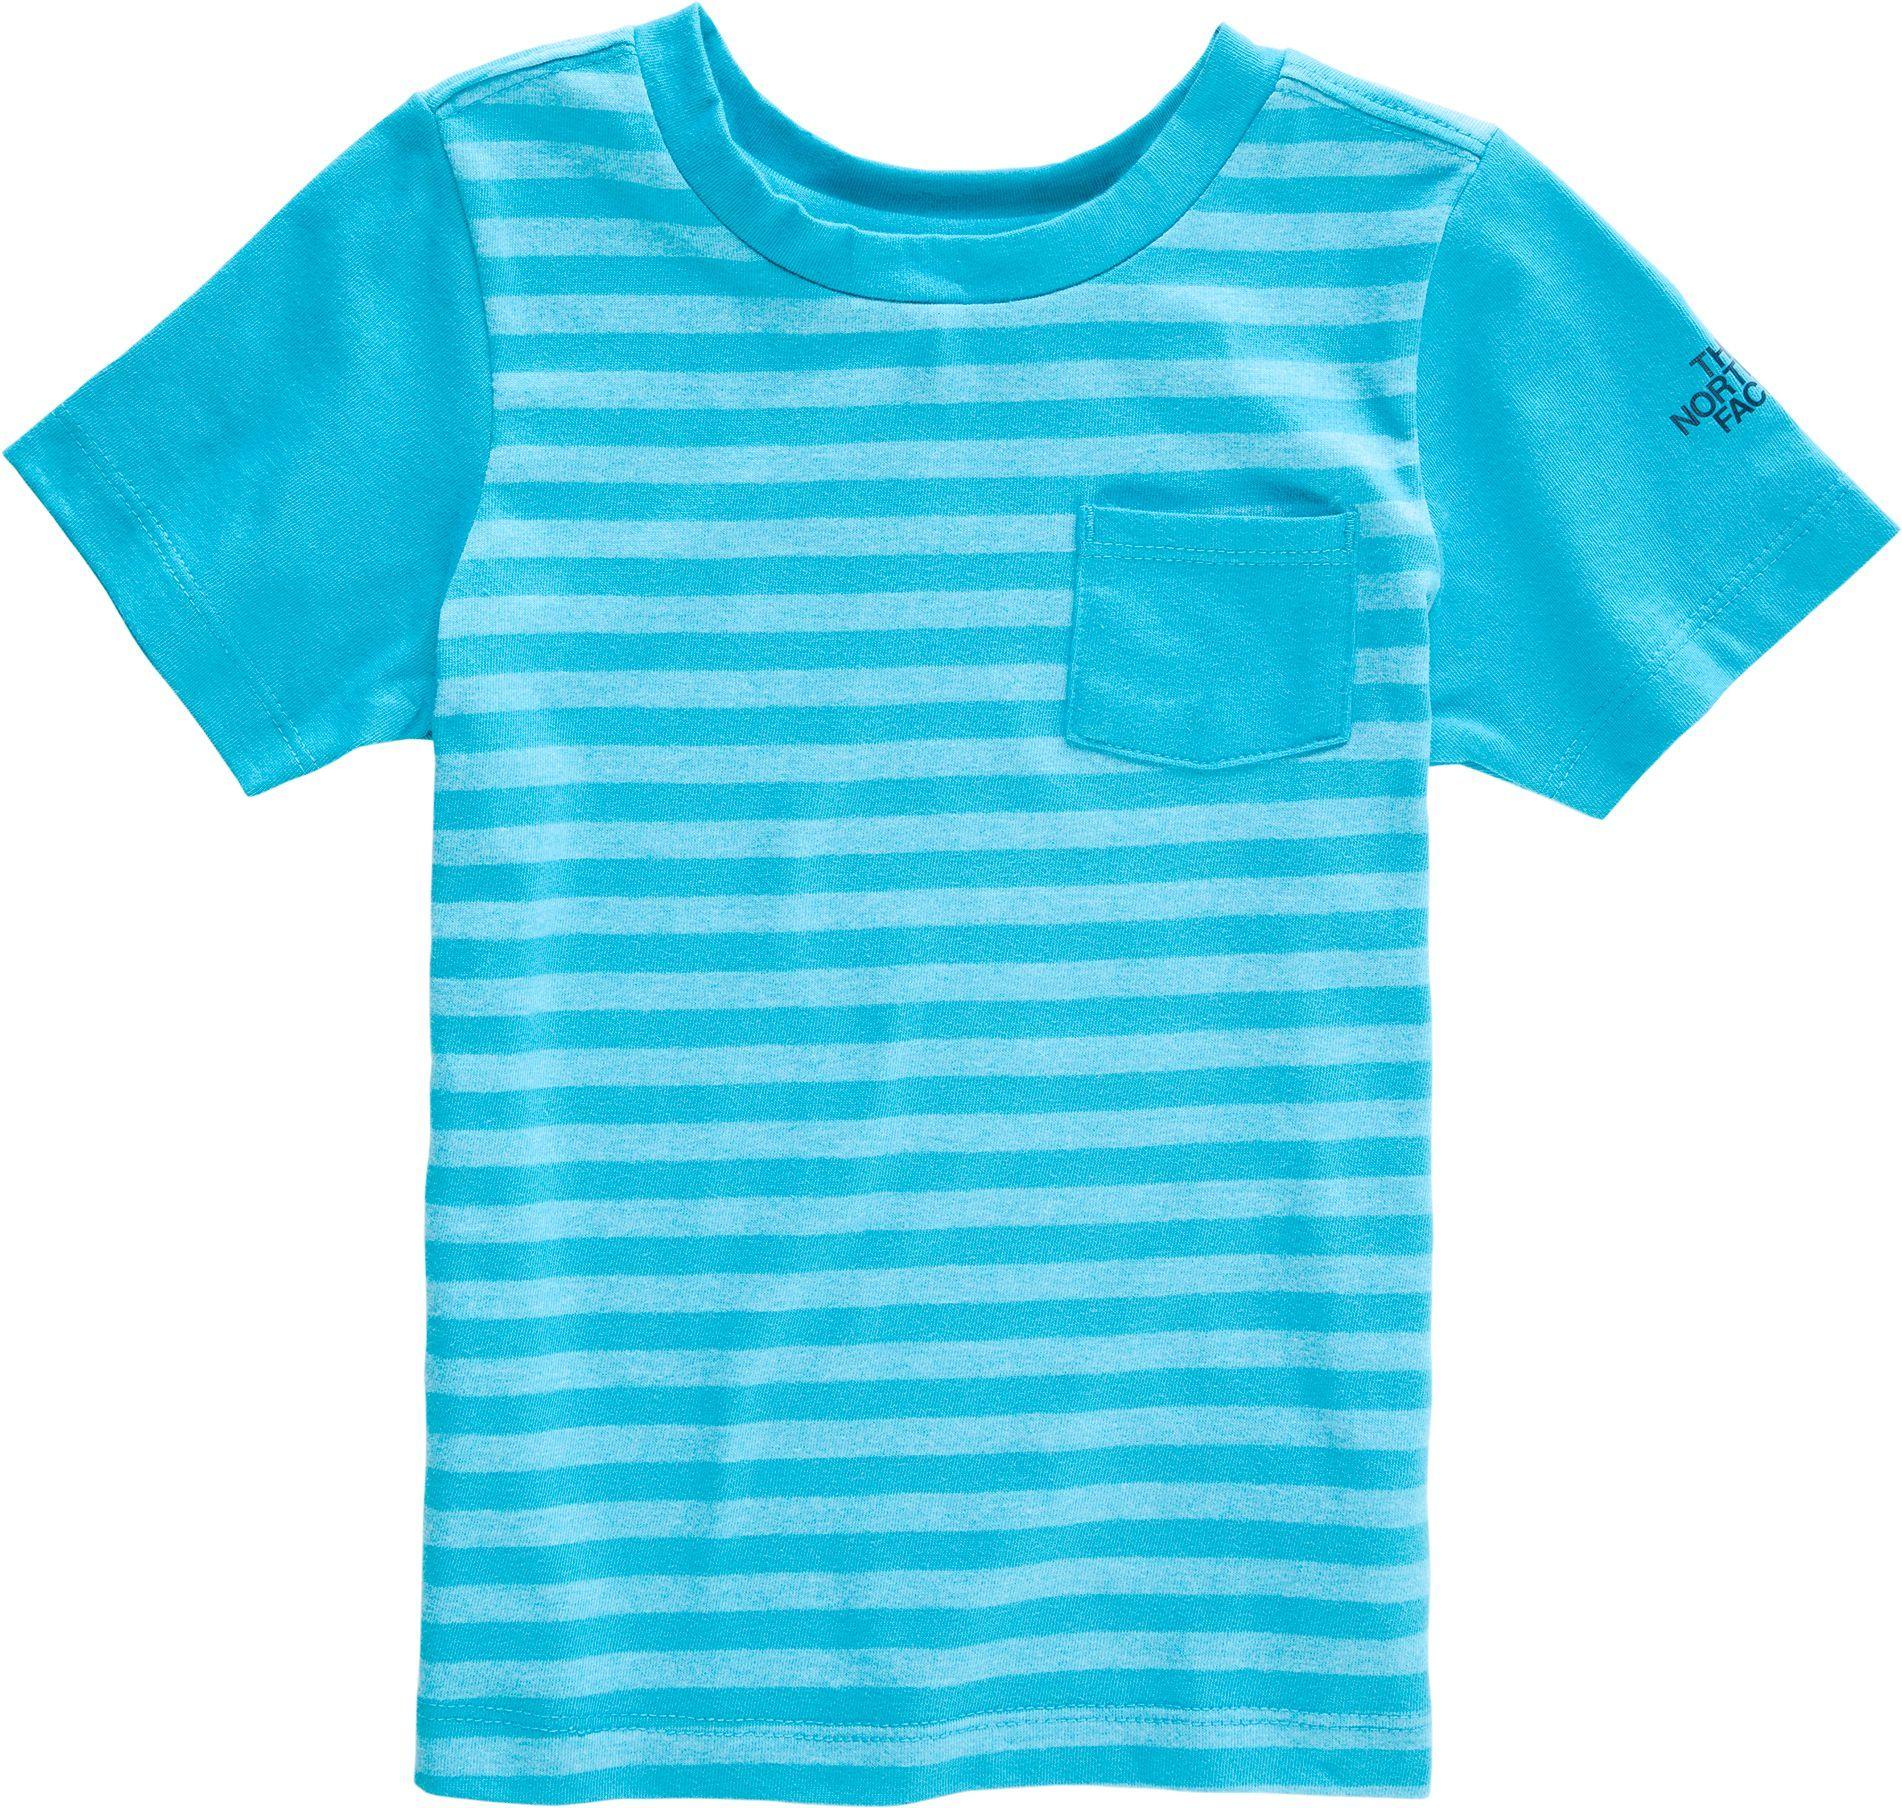 SANTA MONICA Boys Polo T Shirt Kids Pique Top American USA Short Sleeved Summer